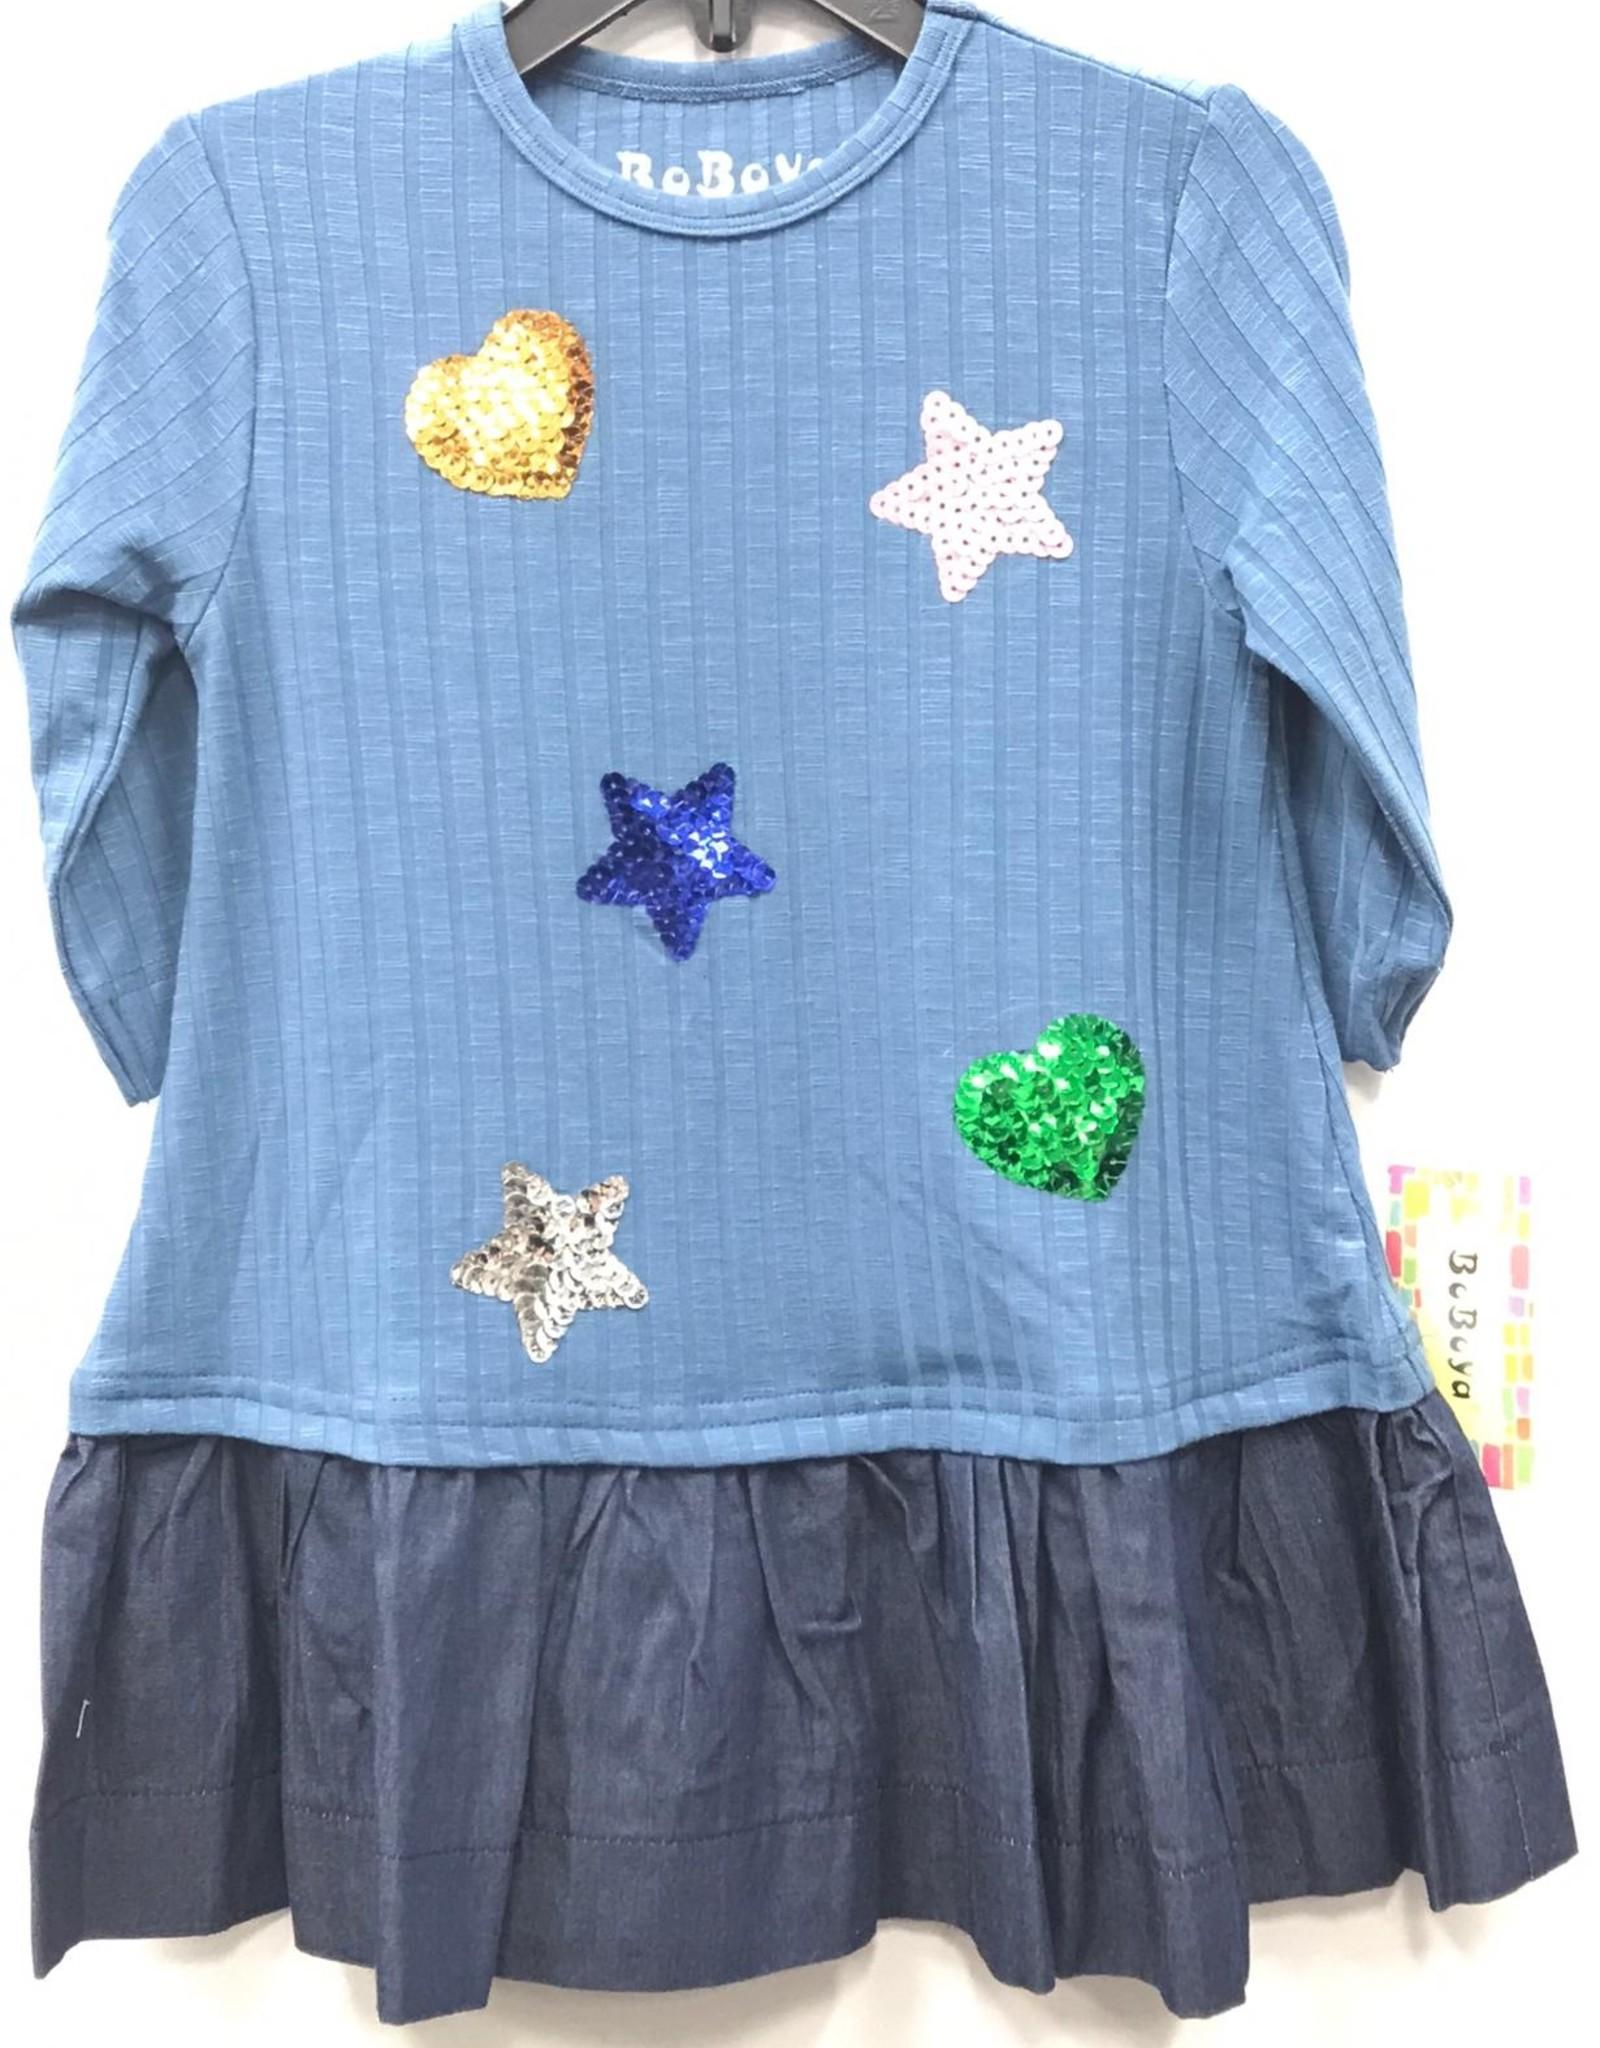 Boboya Boboya Multi Sequin Hearts Dress